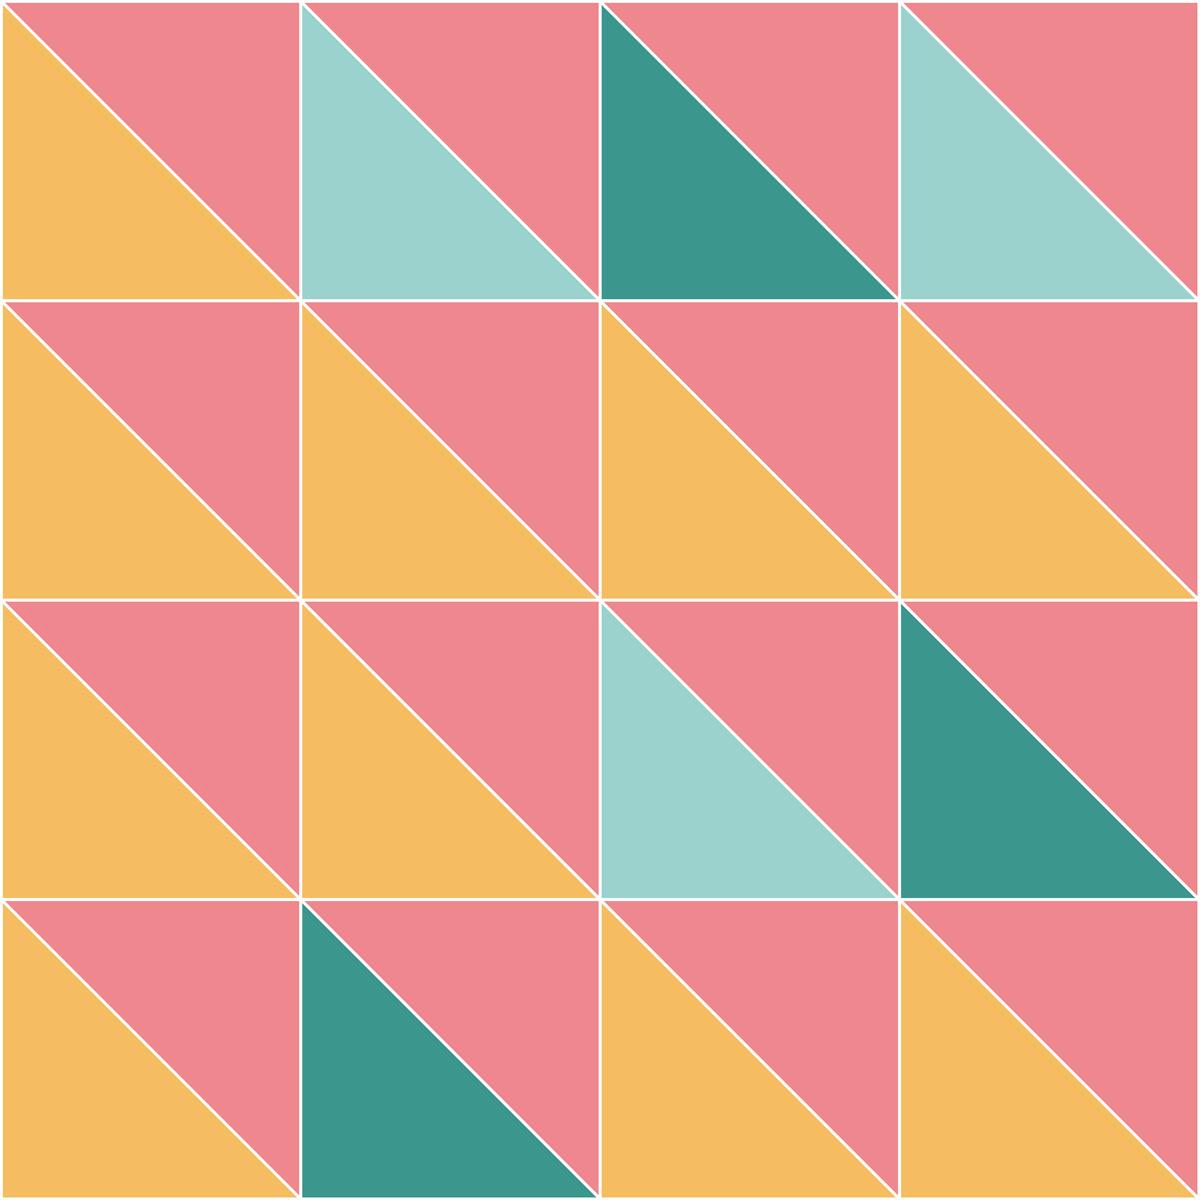 Half Square Triangle Study